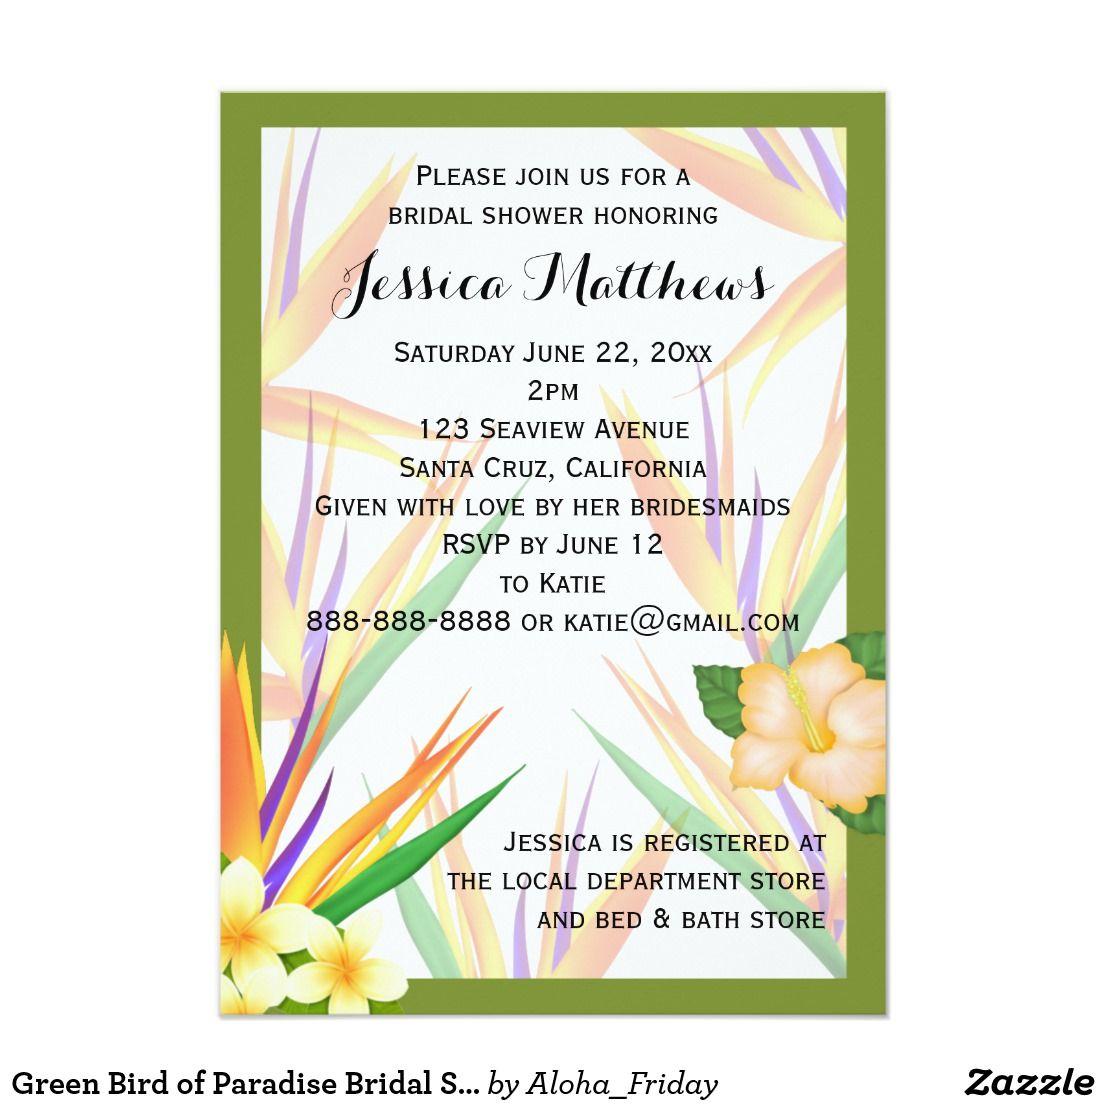 Green Bird of Paradise Bridal Shower Wedding Invitation   Wedding ...